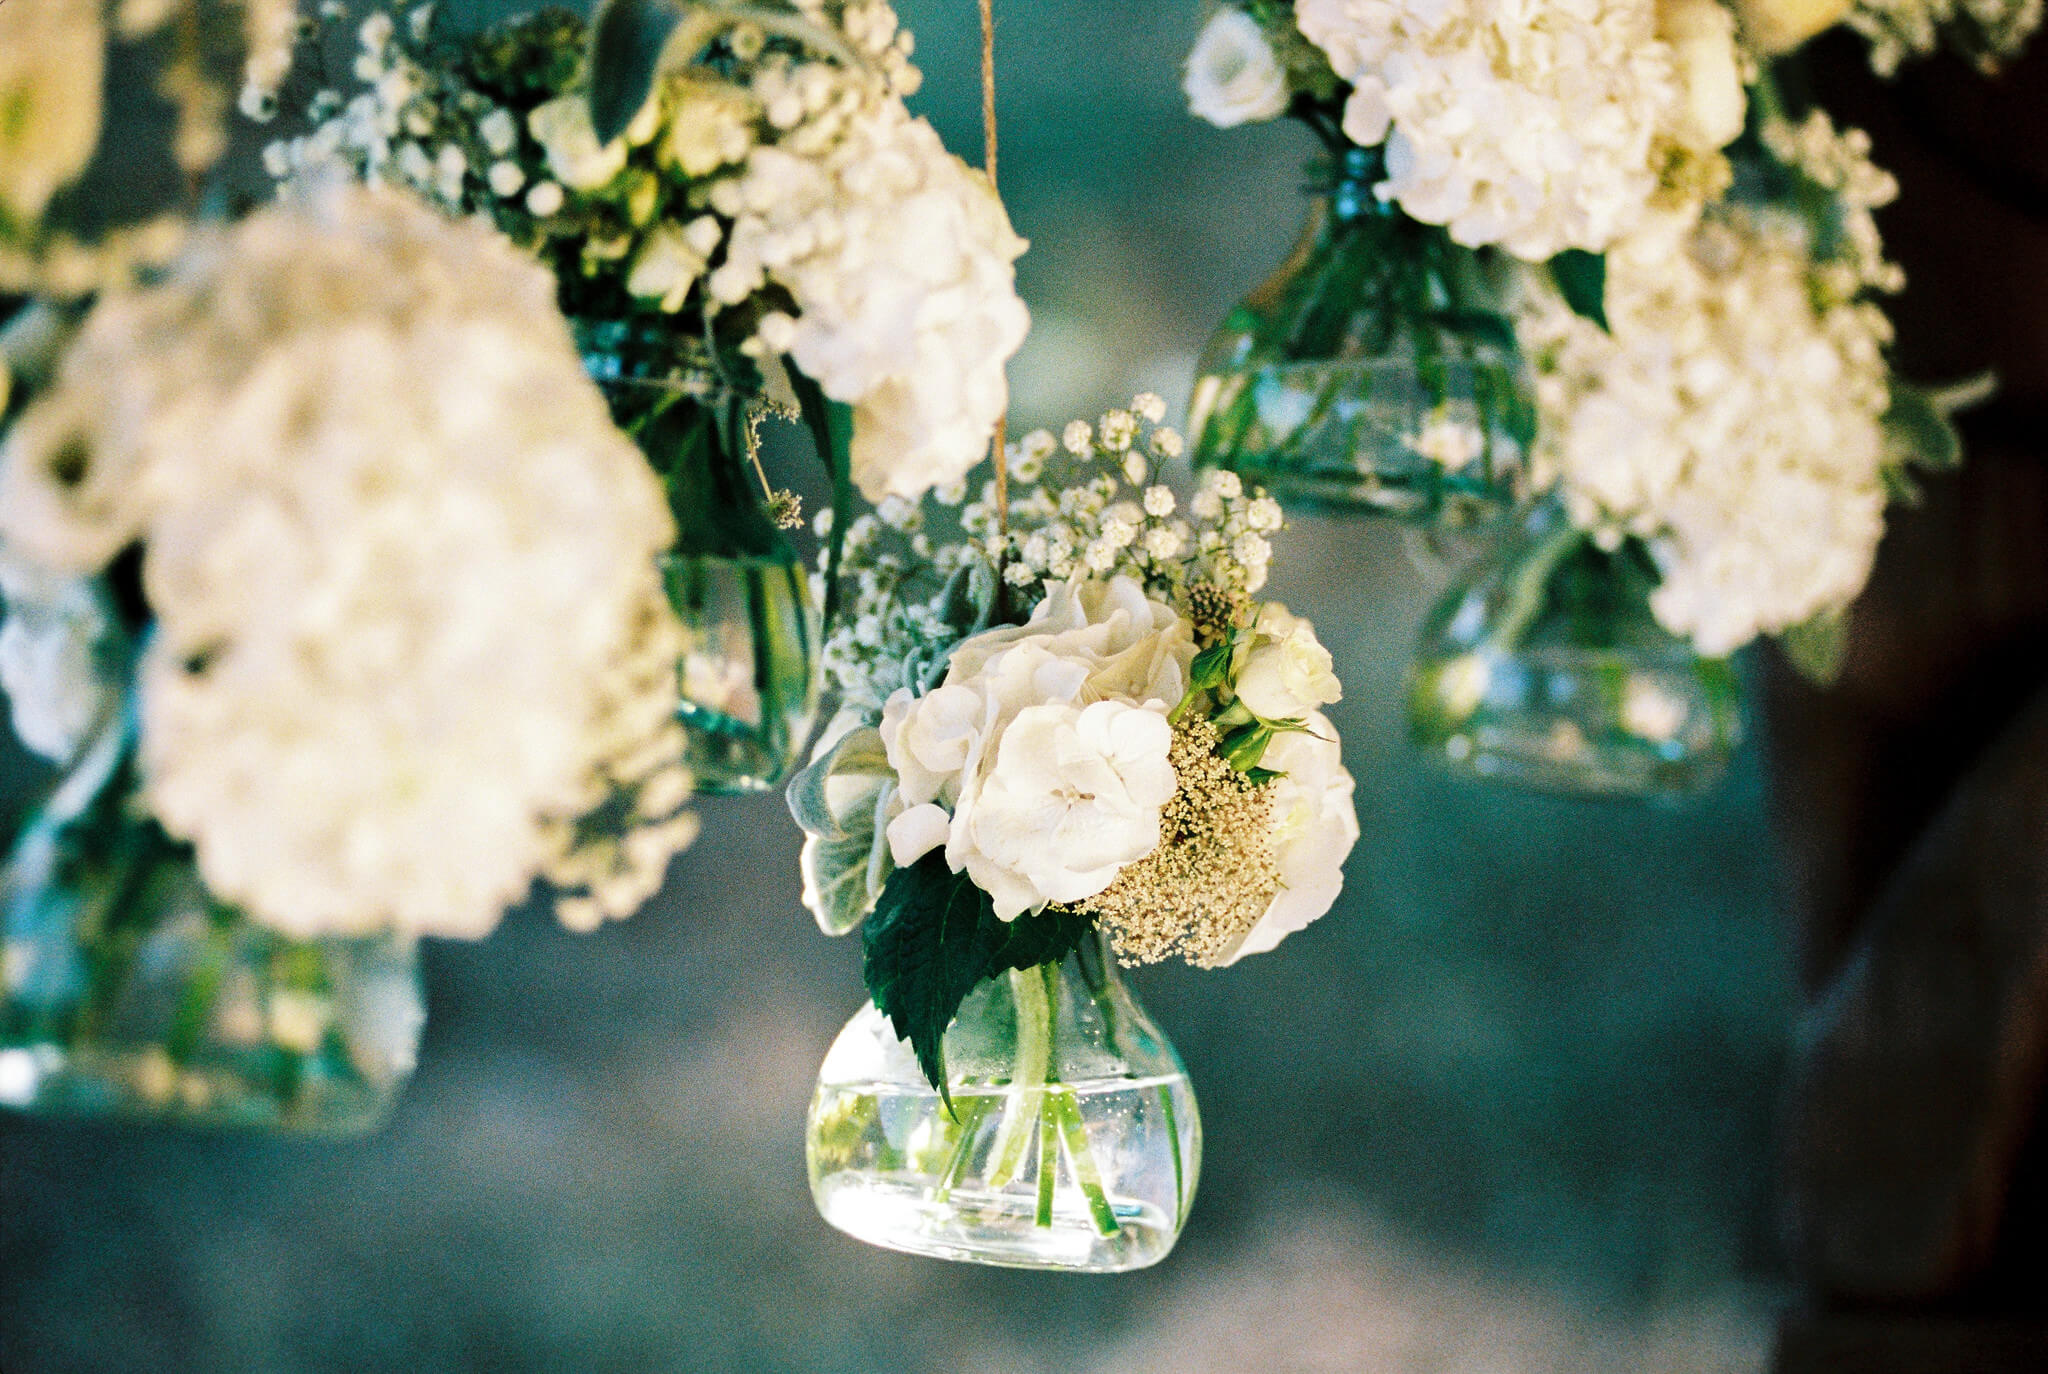 https://www.white-ibiza.com/wp-content/uploads/2020/03/ibiza-wedding-venues-amante-ibiza-2020-04.jpg